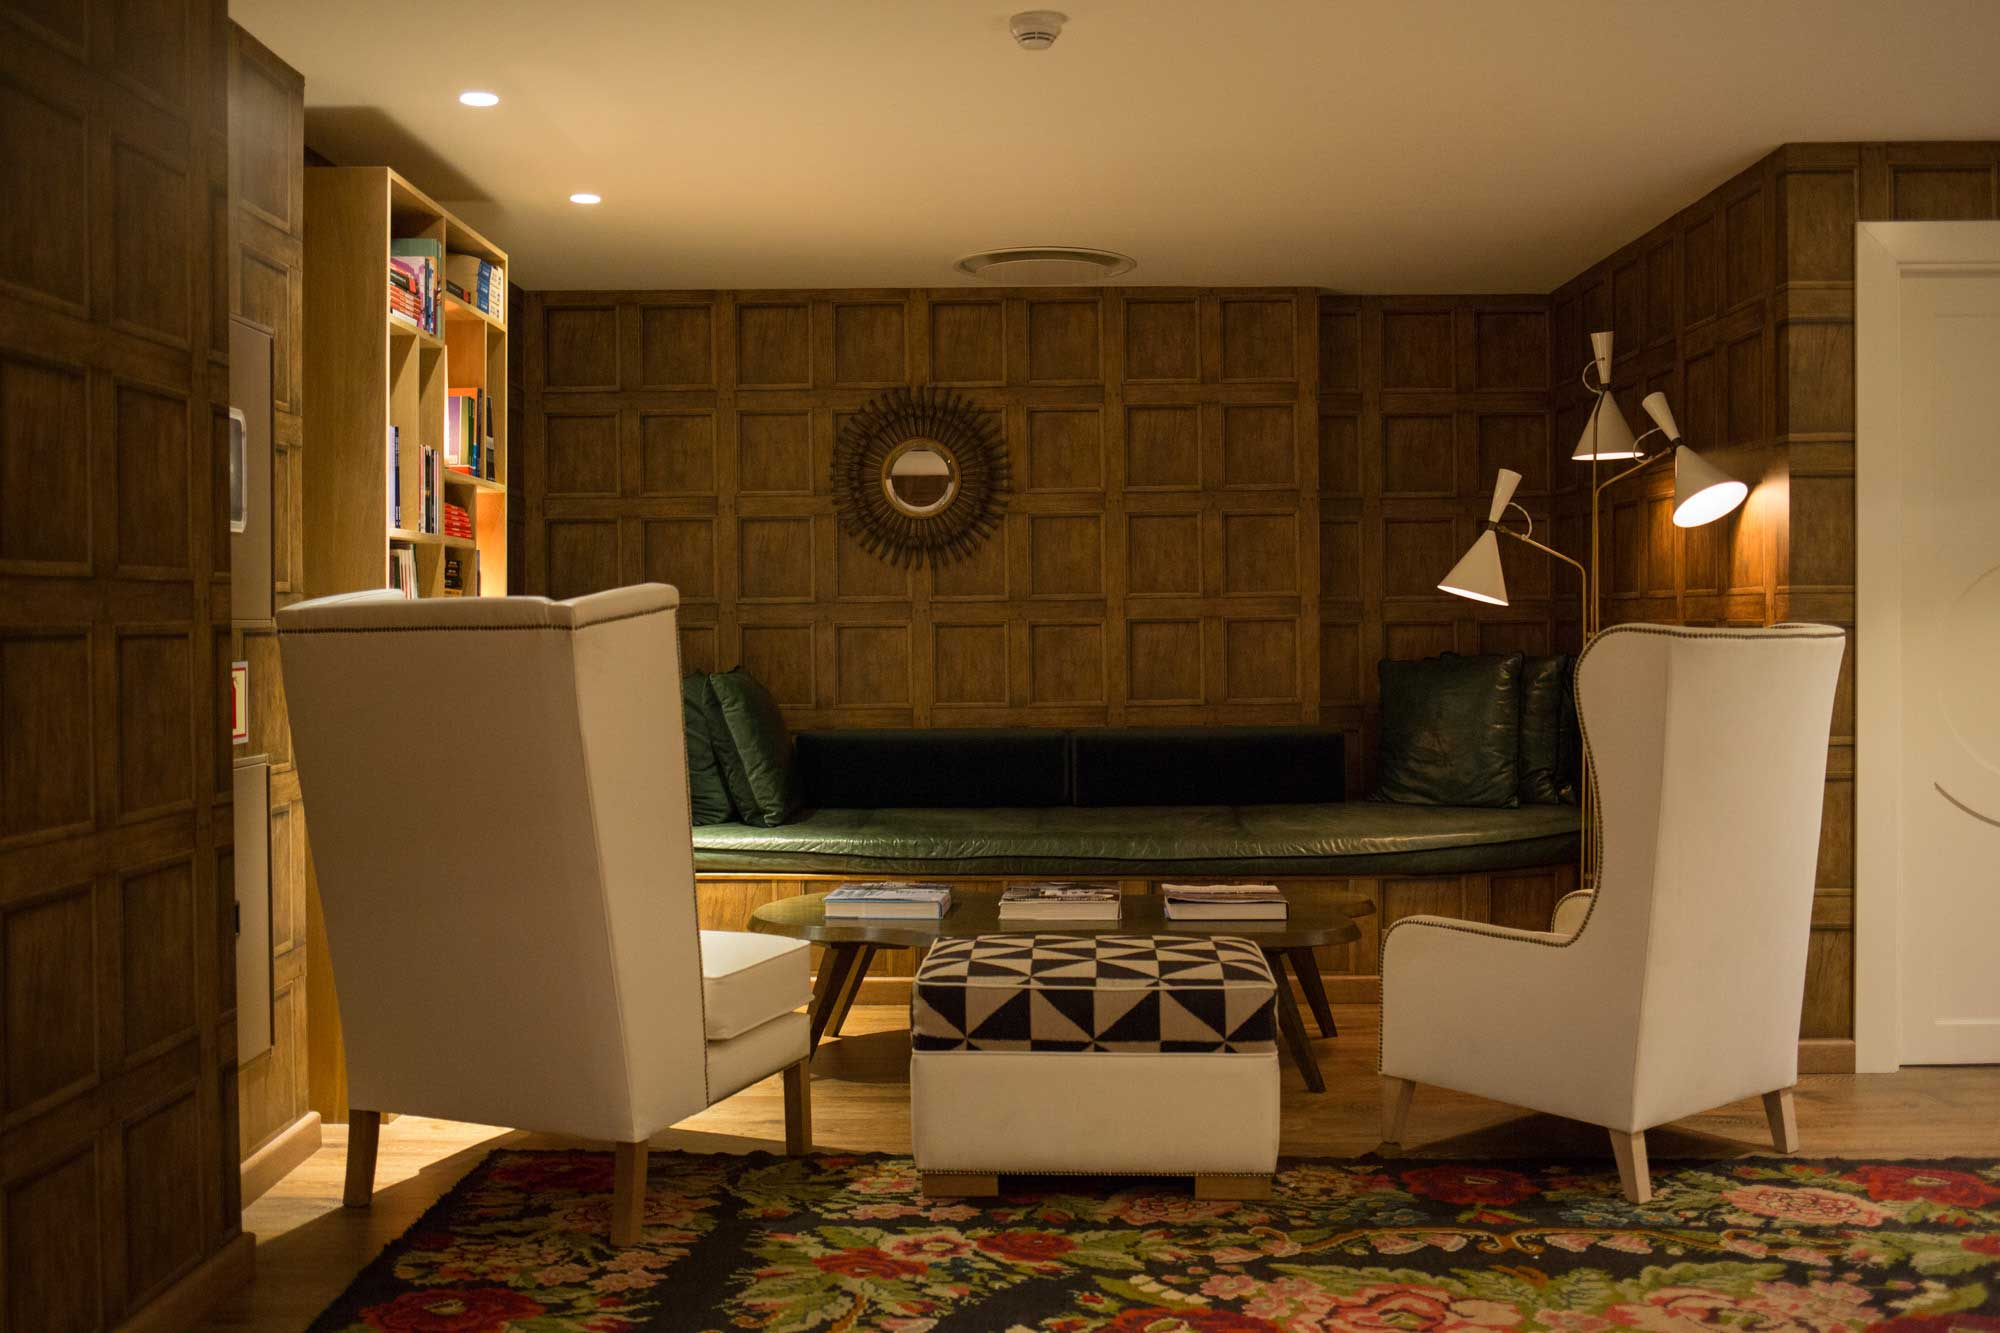 Hotel-Ofelias-Barcelona-8.jpg